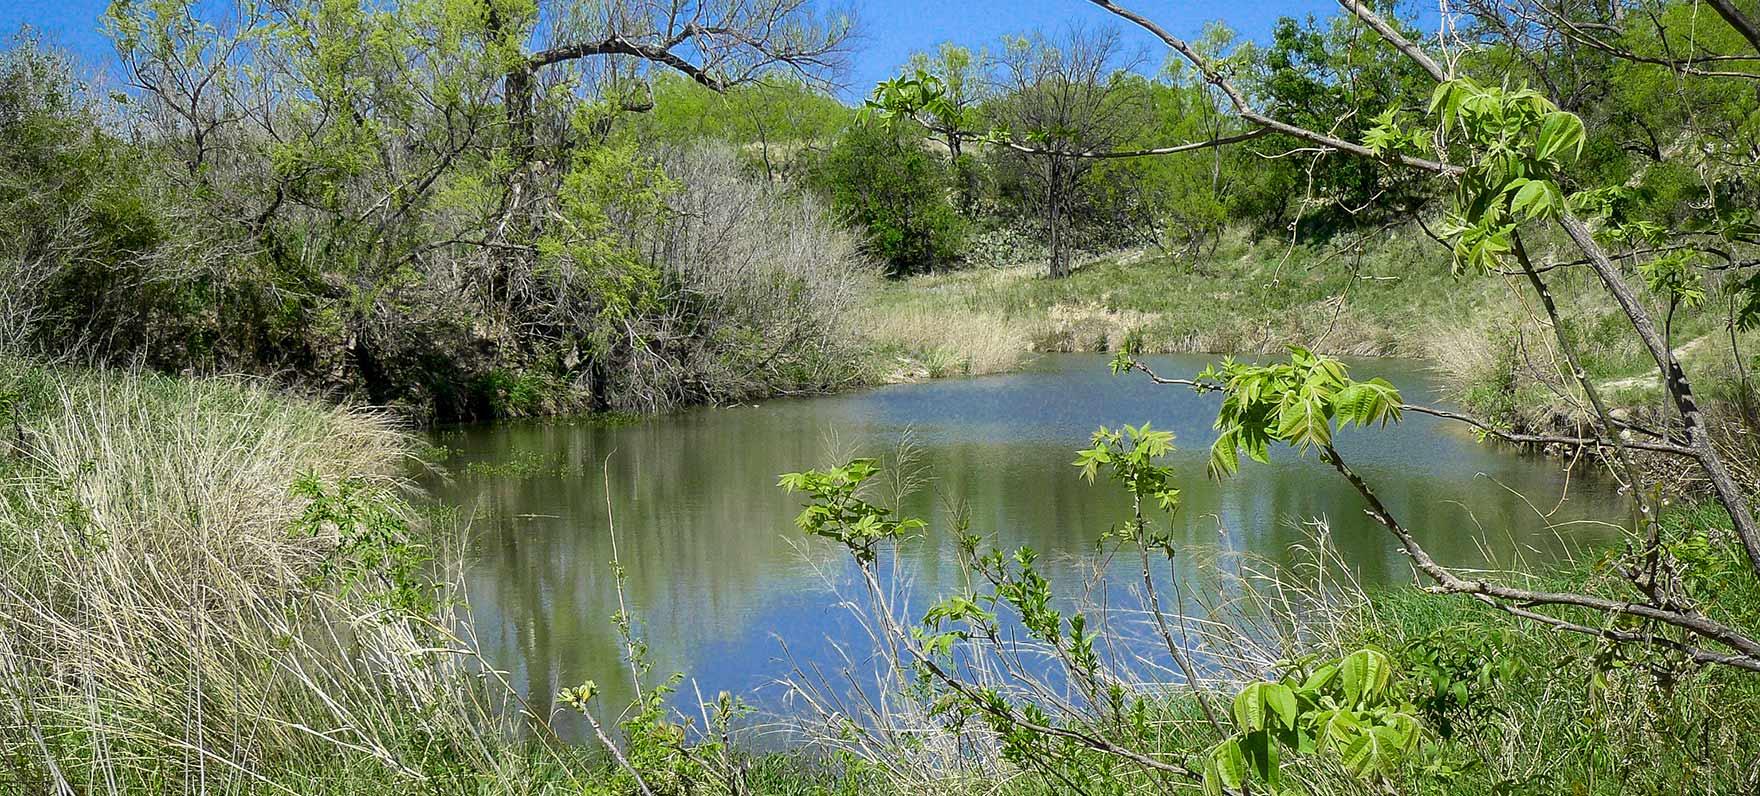 san angelo state park  u2014 texas parks  u0026 wildlife department